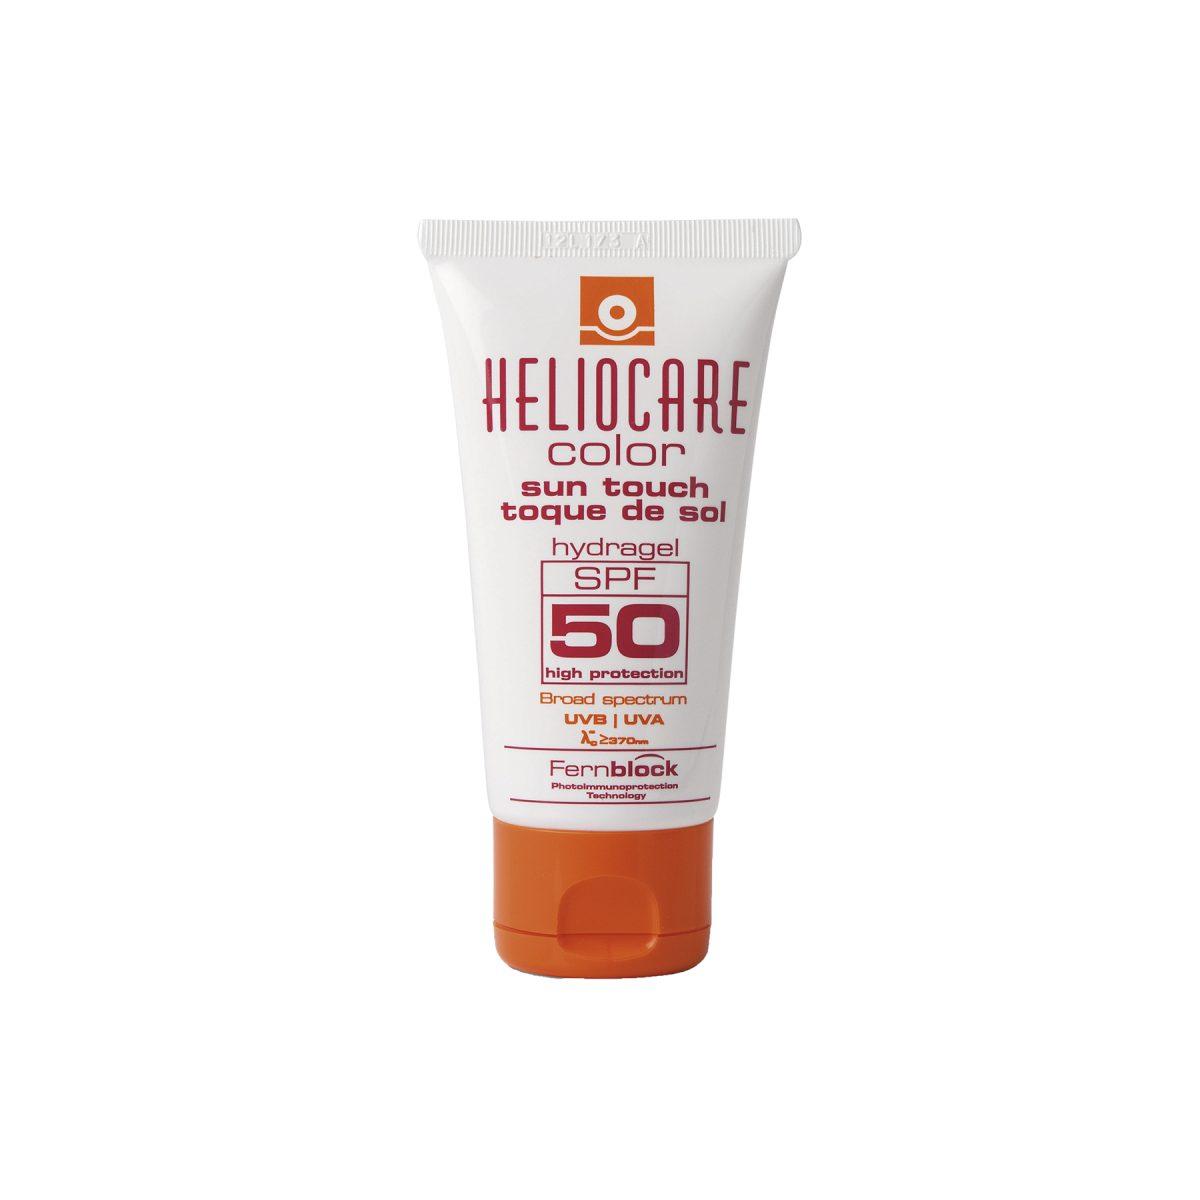 HELIOCARE COLOR SUN TOUCH HYDRAGEL SPF50